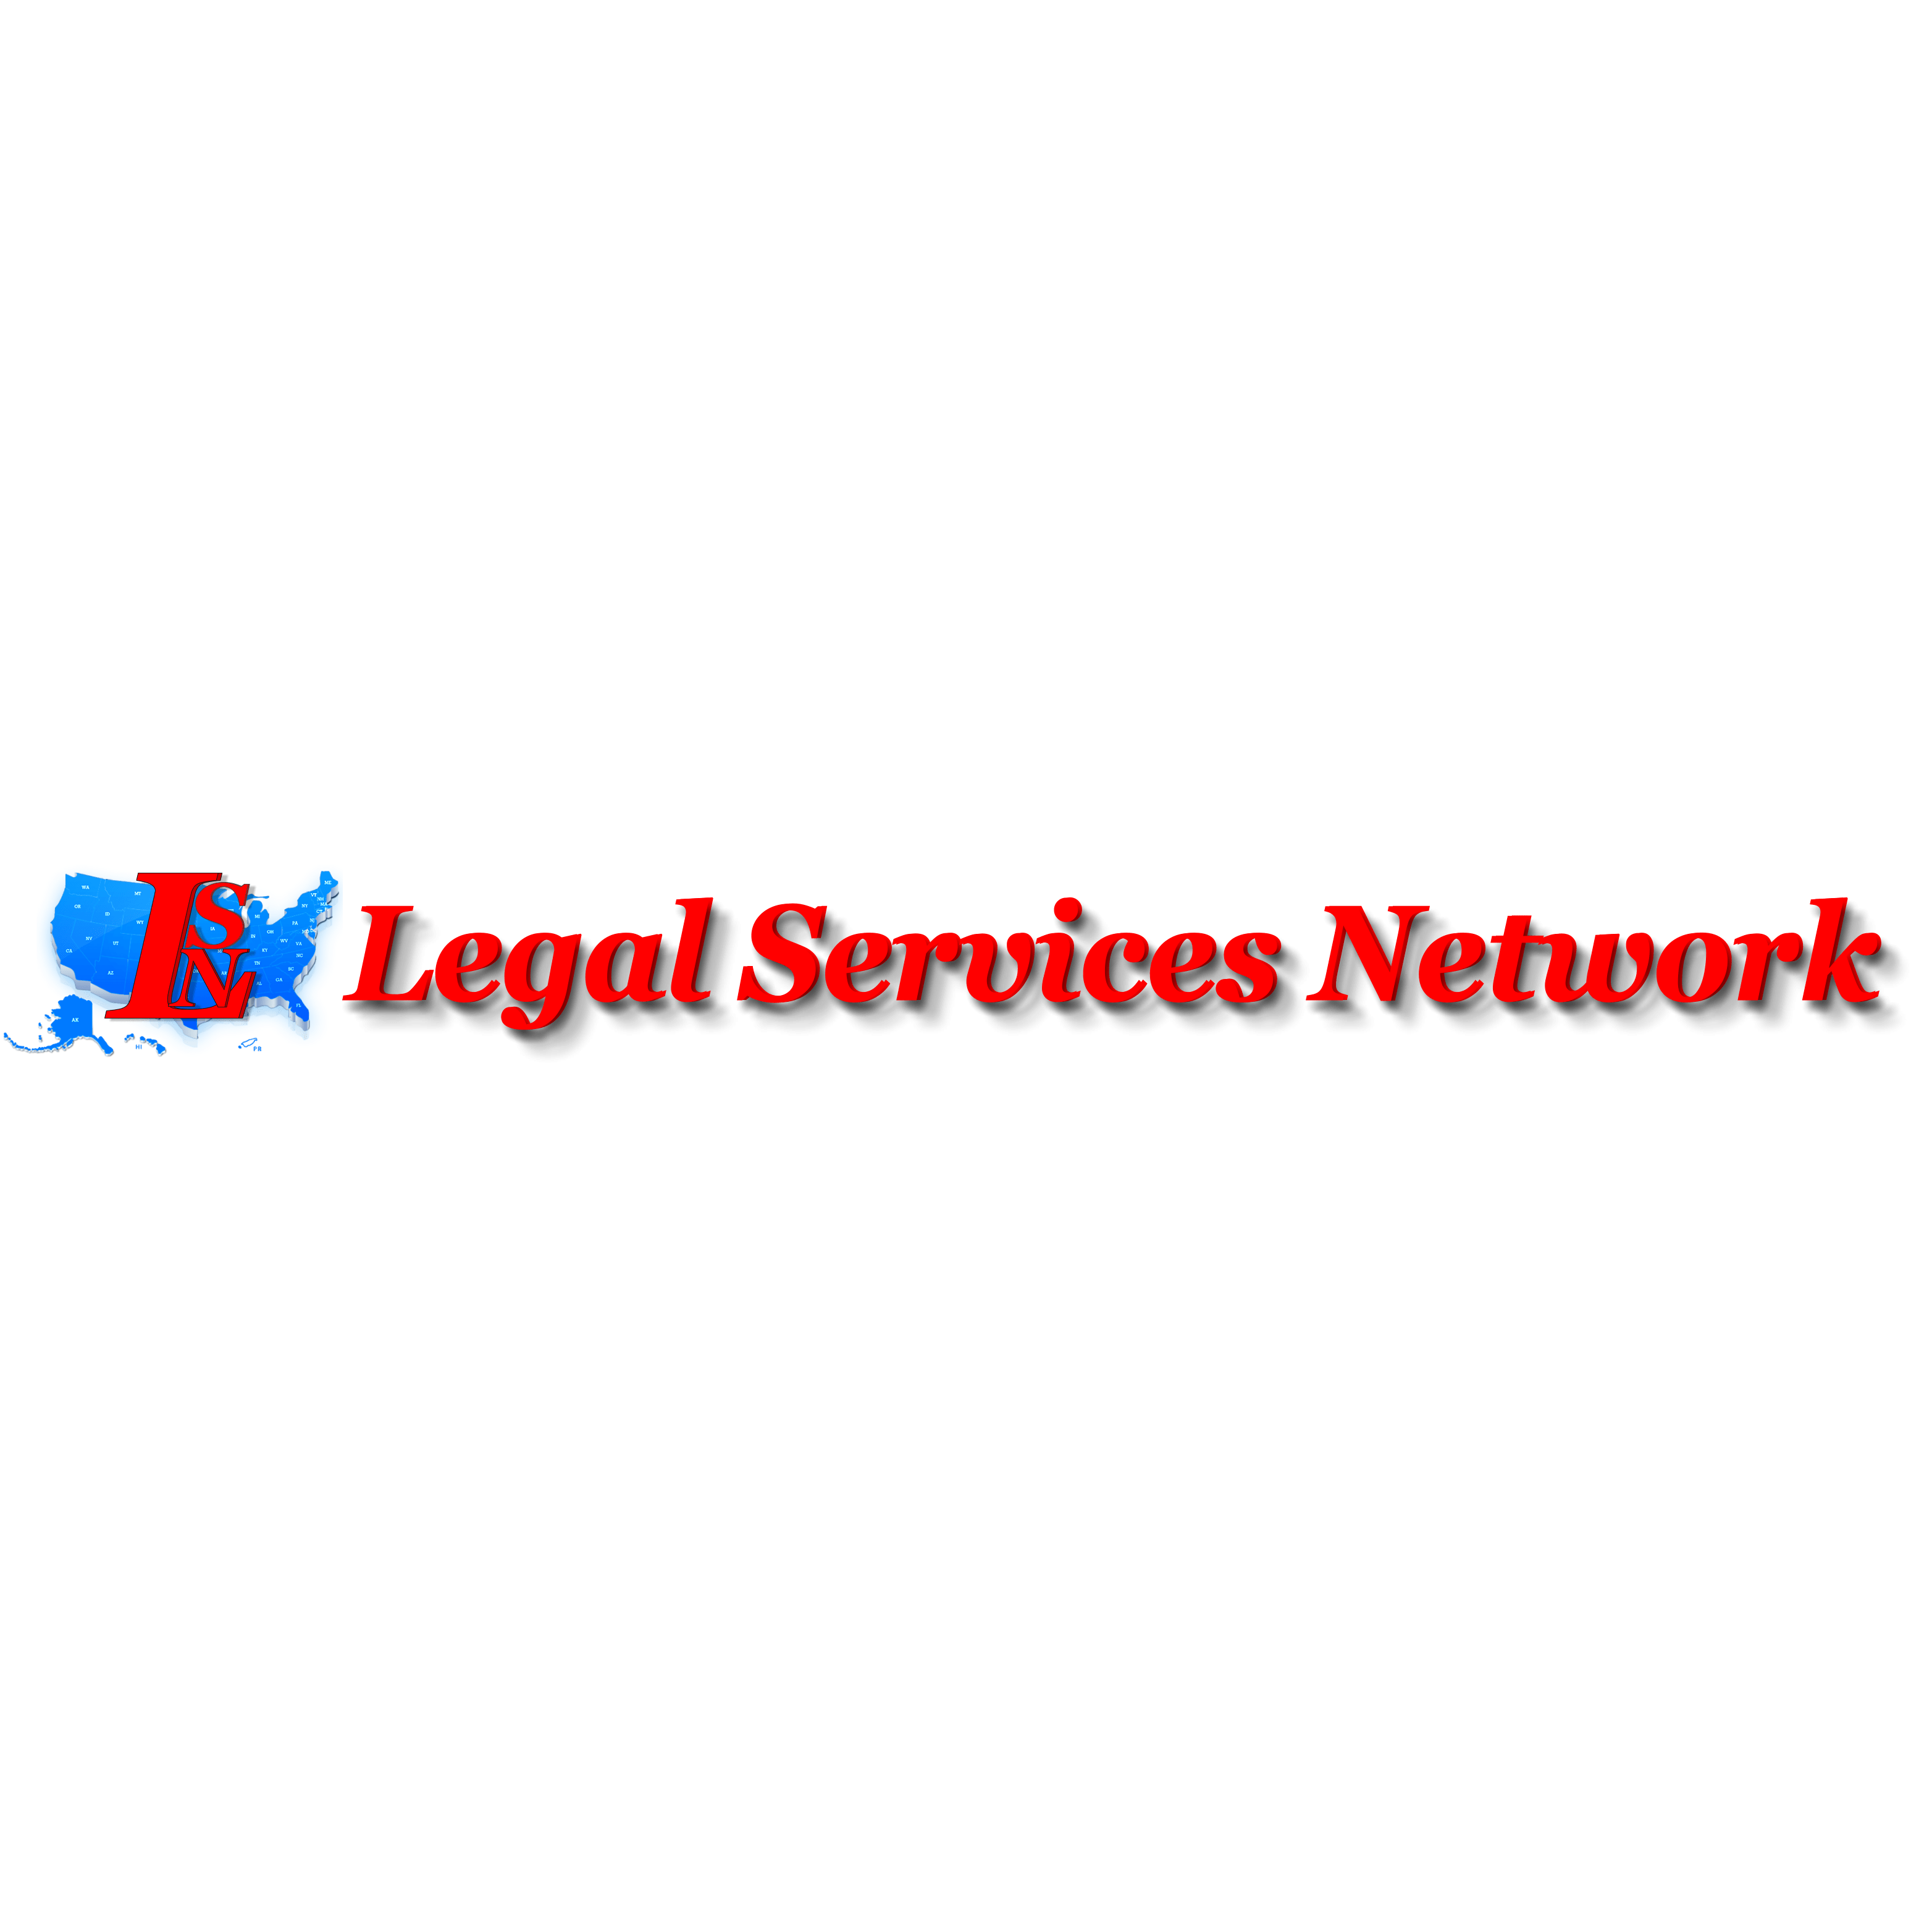 Legal Services Network, LLC